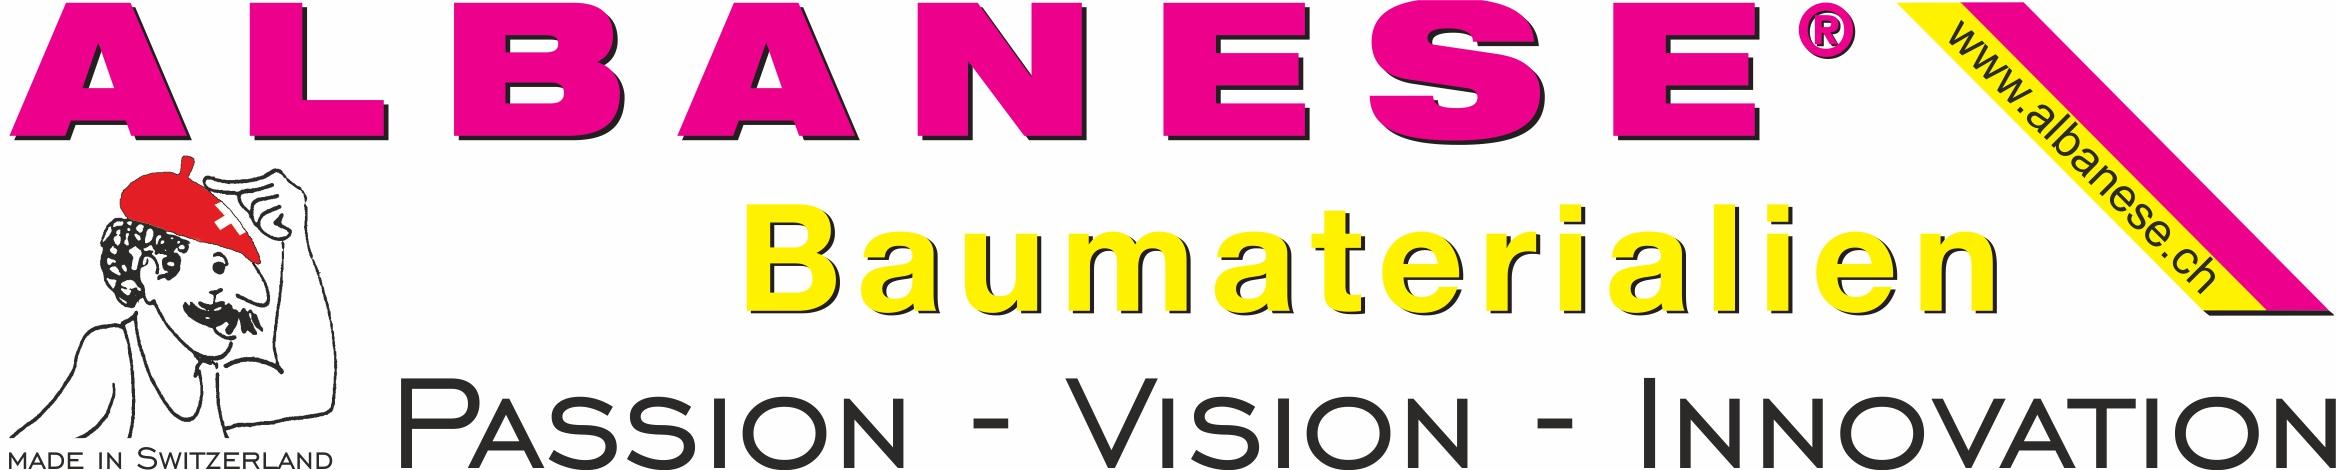 Logo mit www.albanese.ch & Kopf Passion-Vision-Innovation D 2018-02-20